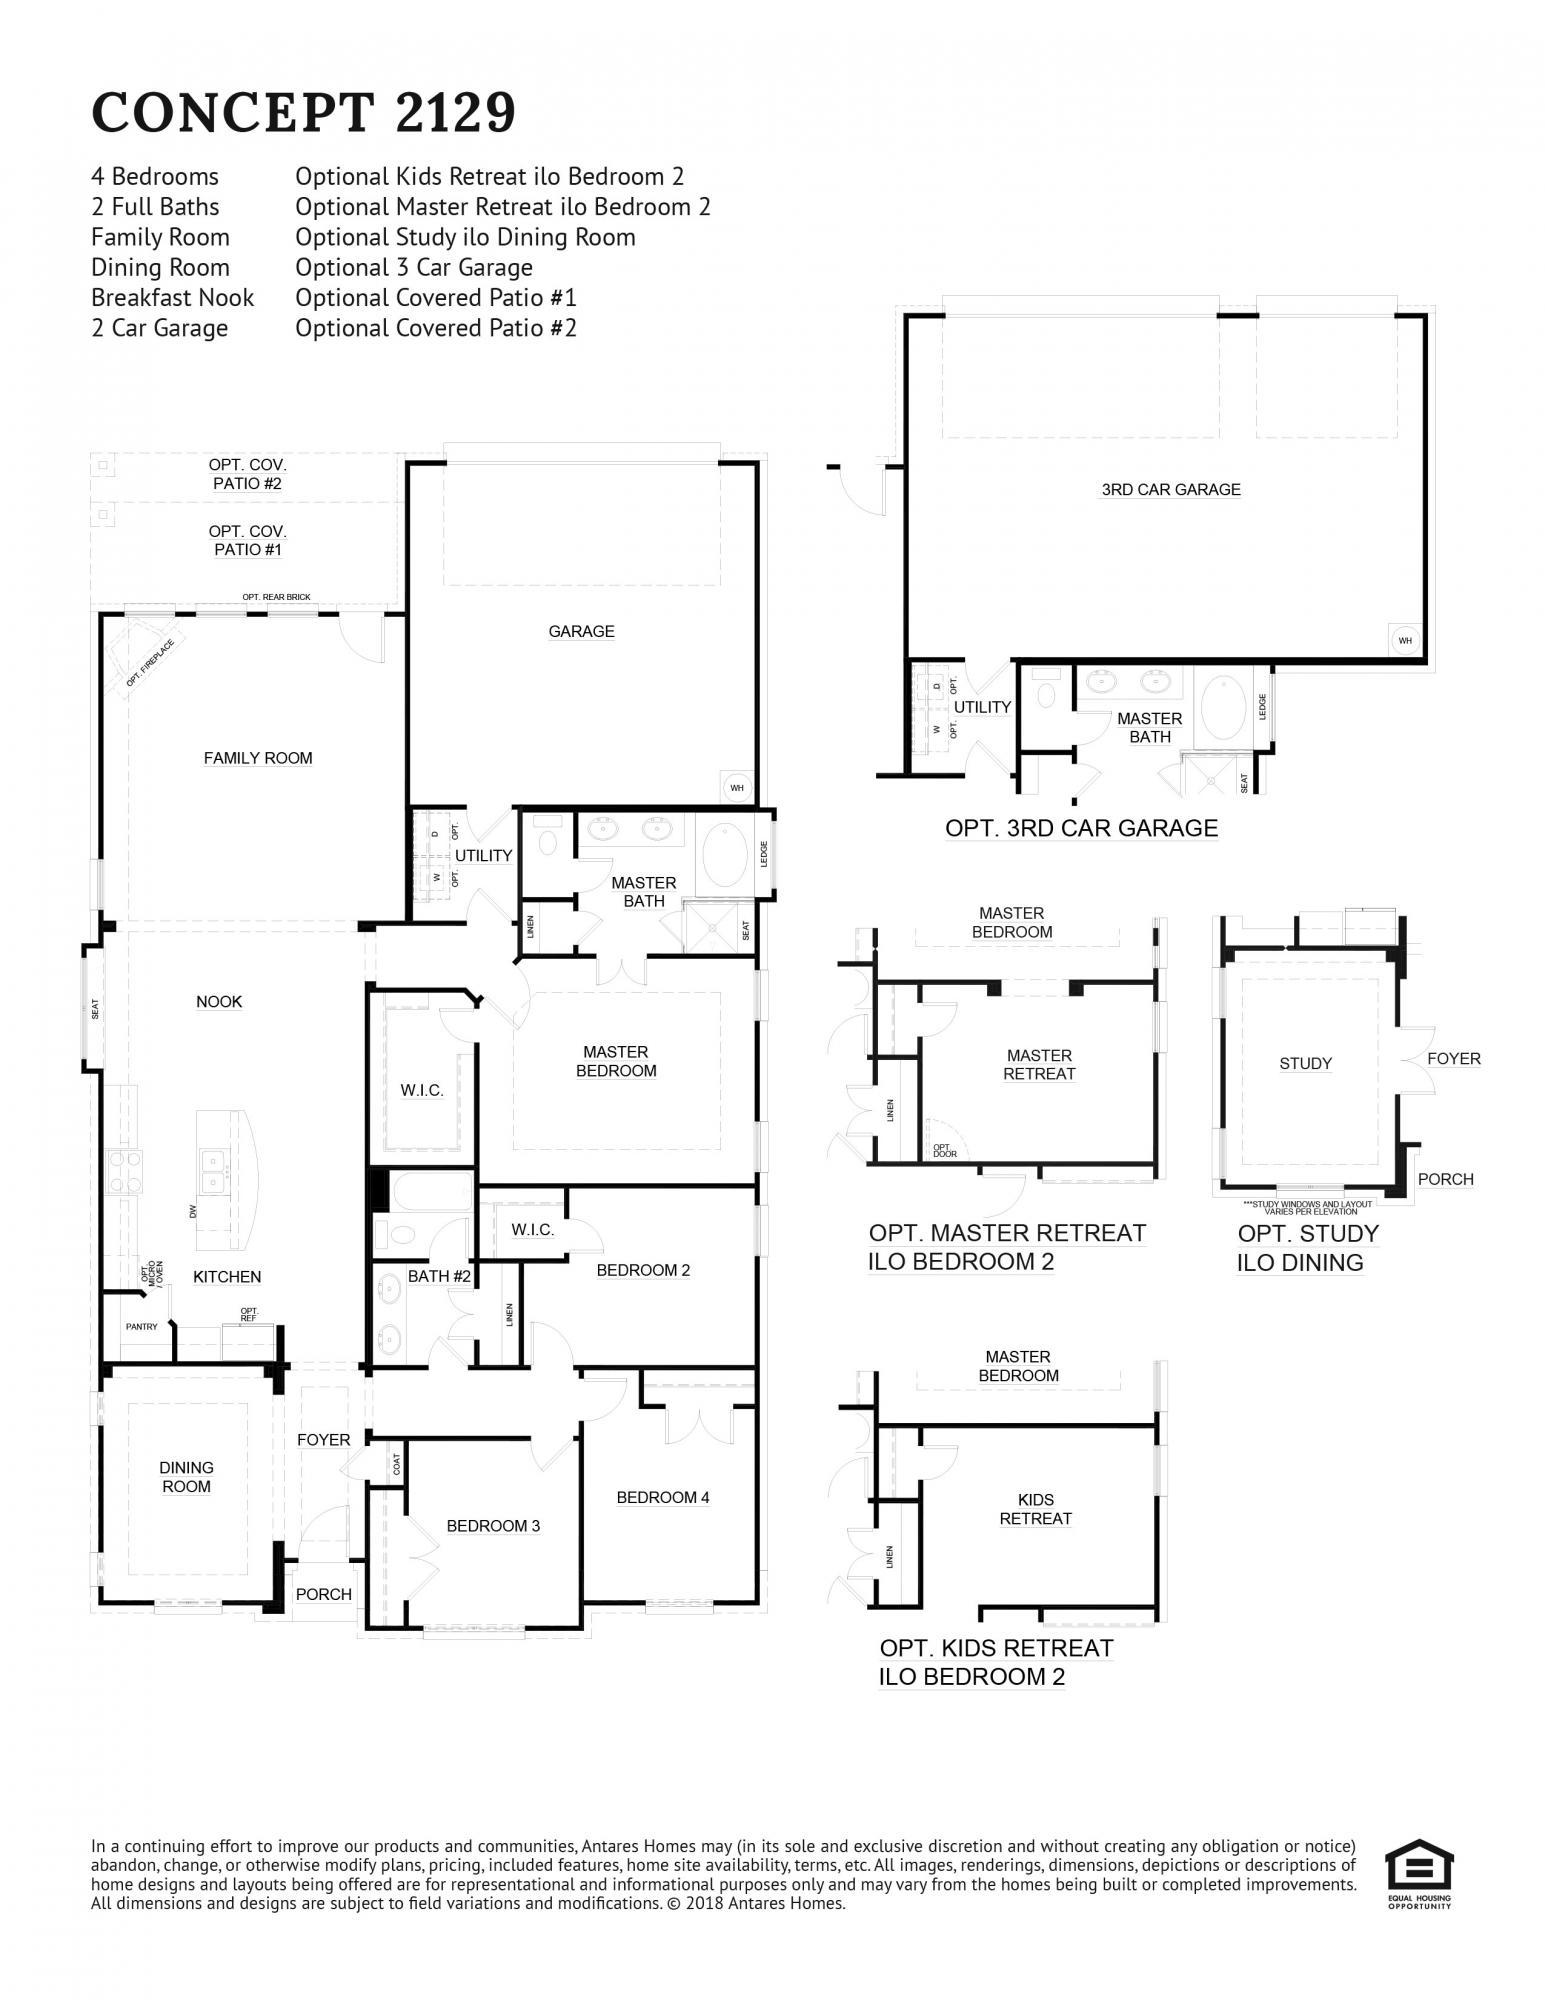 Concept 2129 Floorplan